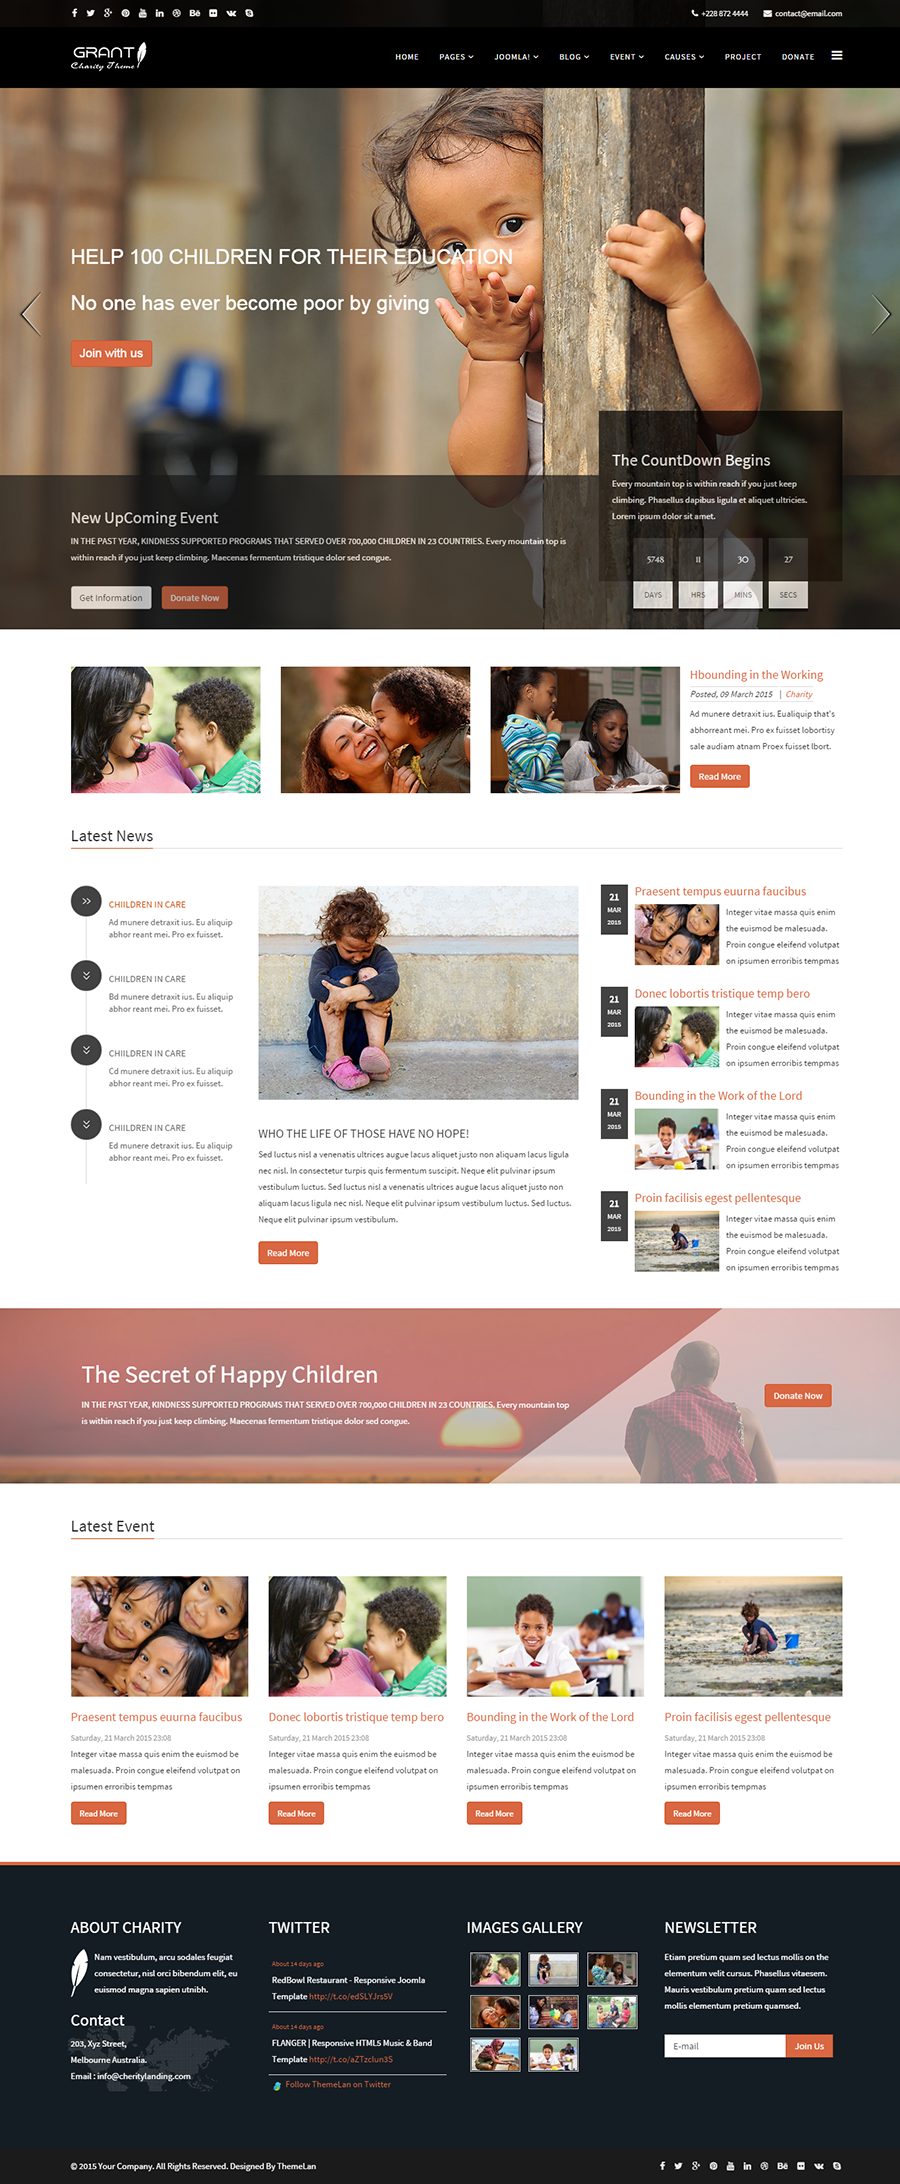 Grant Charity Nonprofit Ngo Html5 Template Web Development Design Website Design Website Design Inspiration